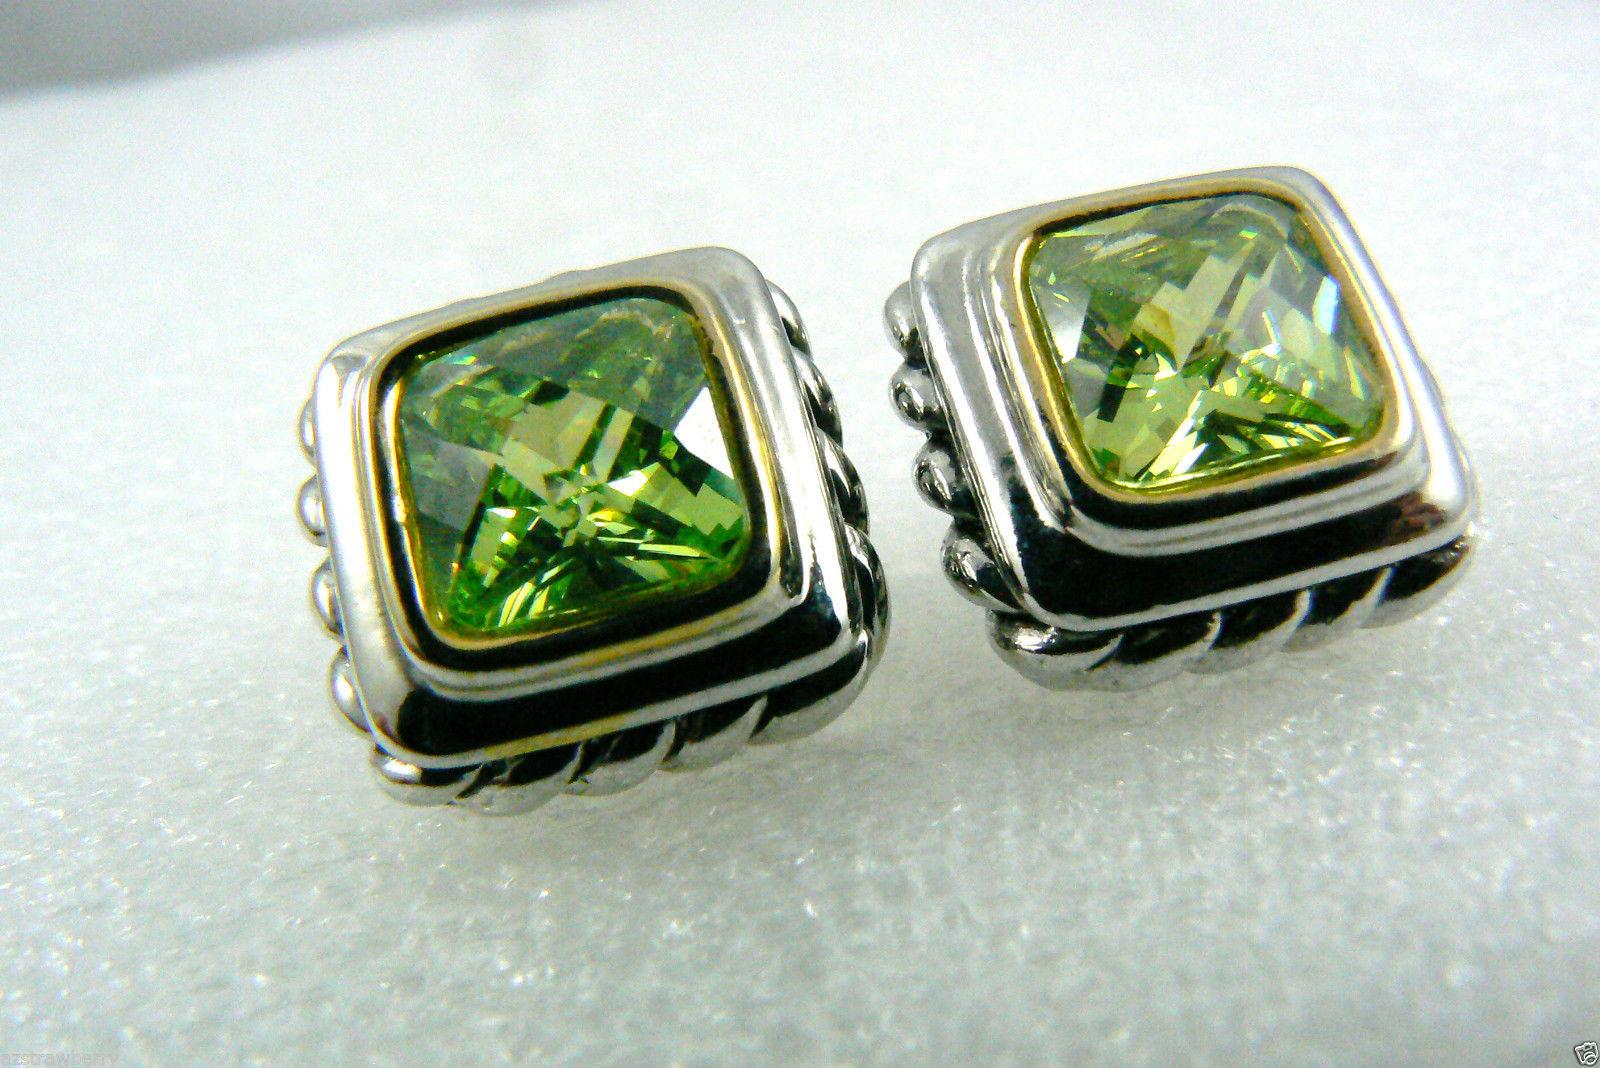 Silver tone Faceted Green Peridot CZ Cubic Zirconia stud earrings $0 sh new image 4